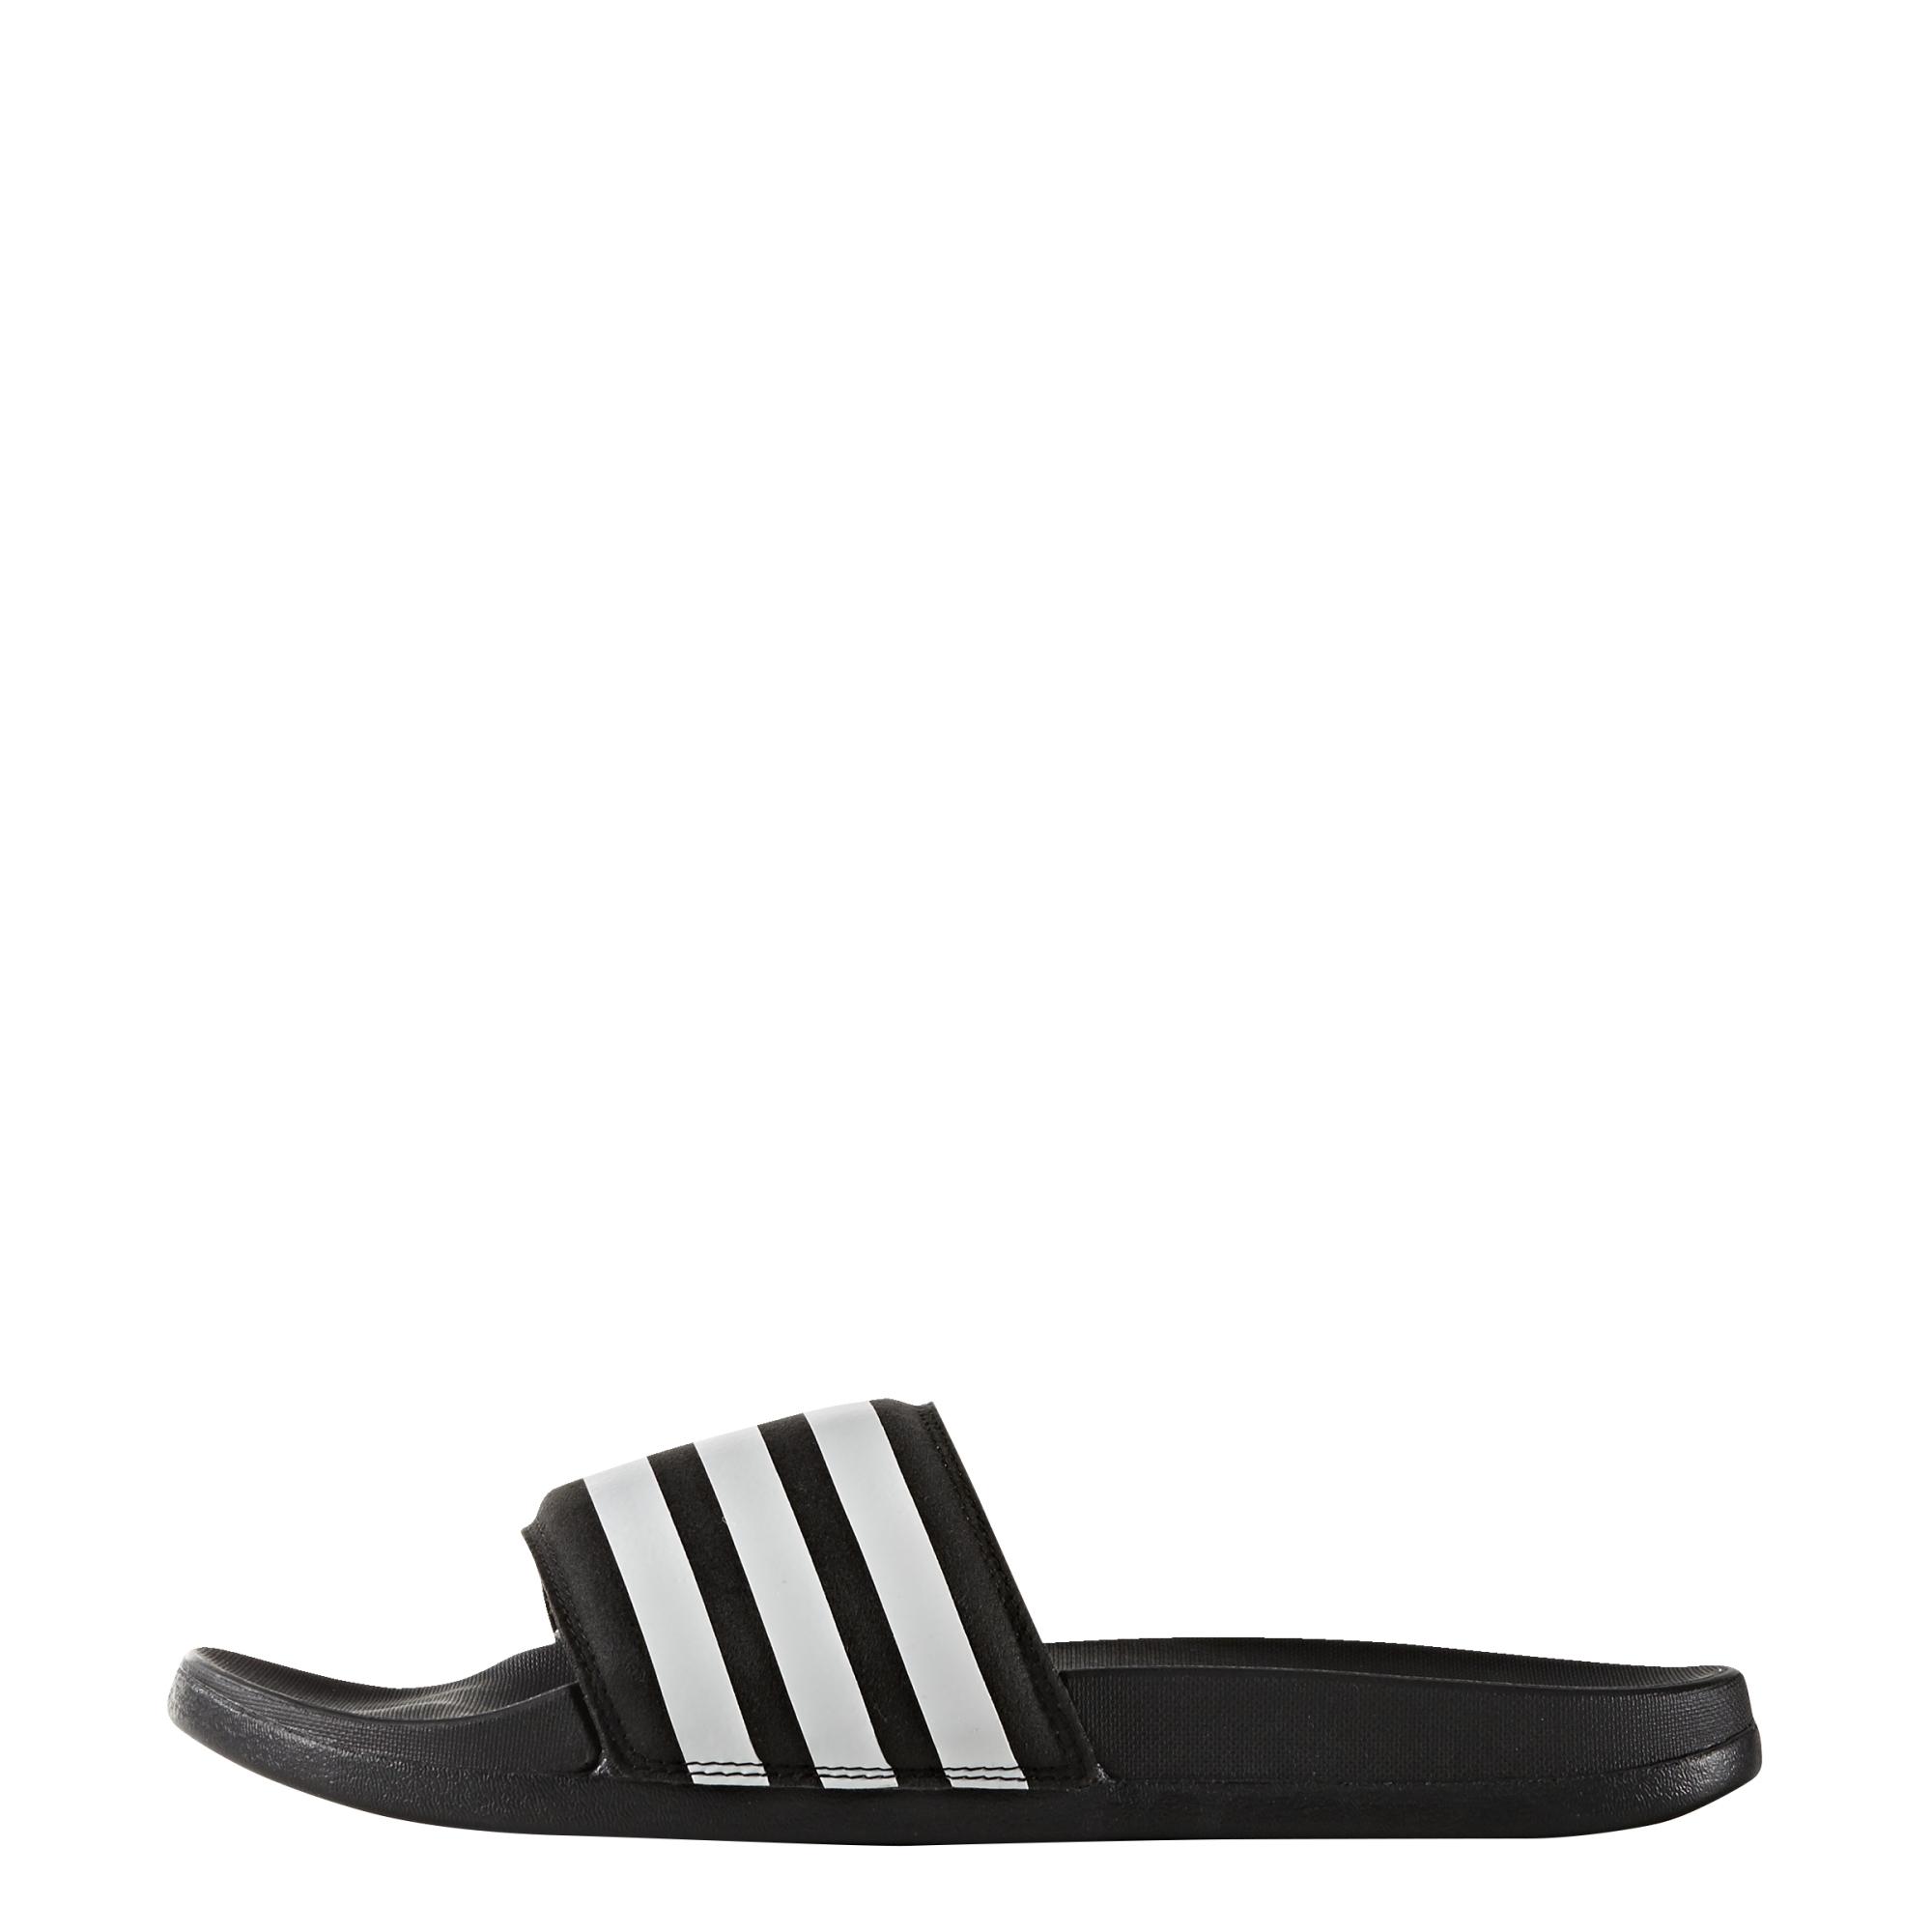 7ab0fde7d699e ... klapki adidas Adilette Cloudfoam Ultra Stripes Slides W S80420 ...